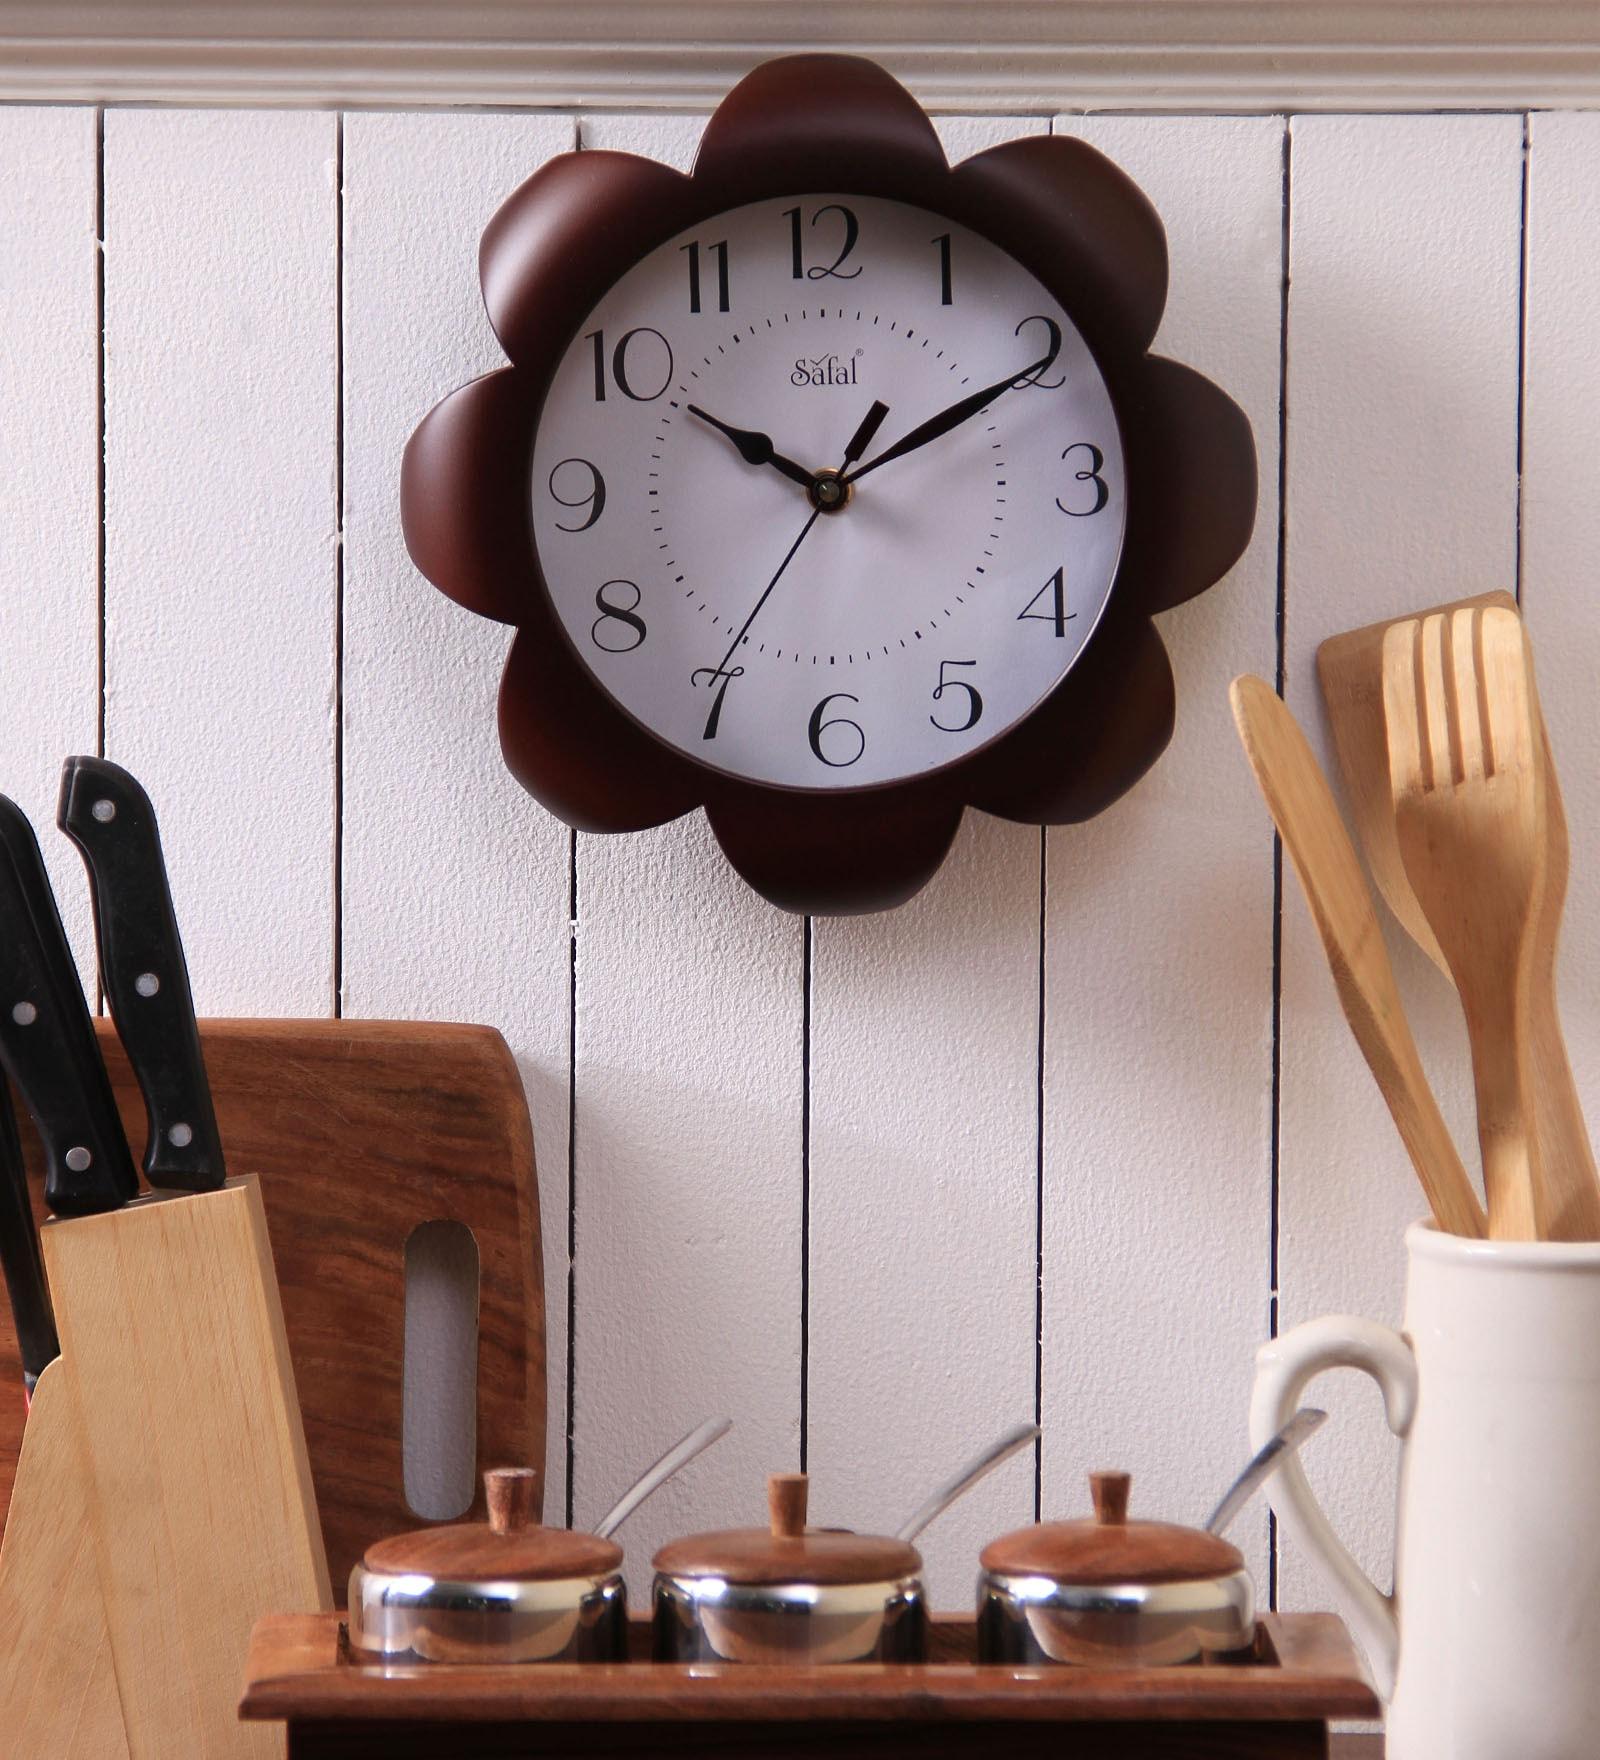 Brown MDF 9 Inch Round Sunflower Look Kitchen Beauty Wall Clock by Safal Quartz